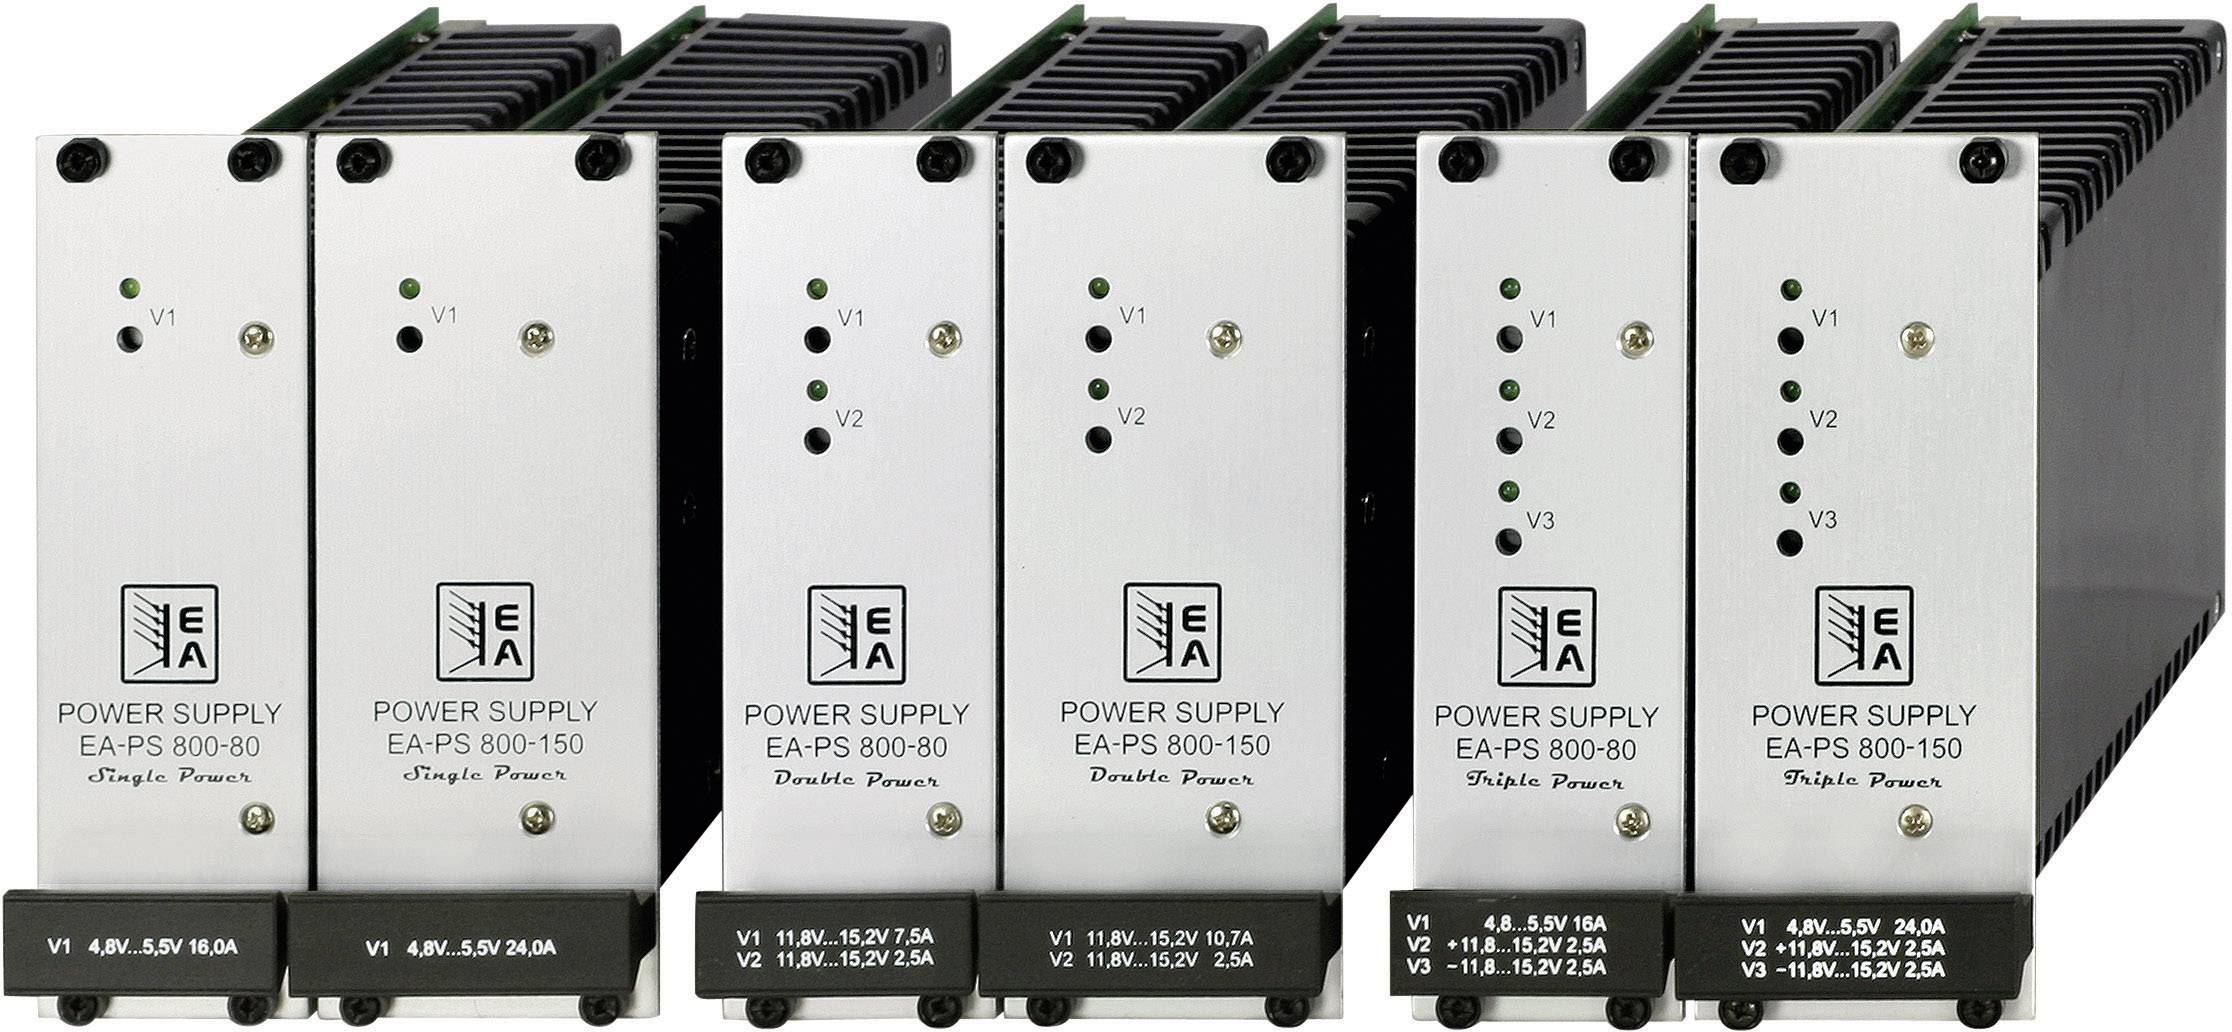 Síťový zdroj na DIN lištu EA-PS 812-24-80 Double, 12/24 V/DC, 7,5/2,5 A, 90 W